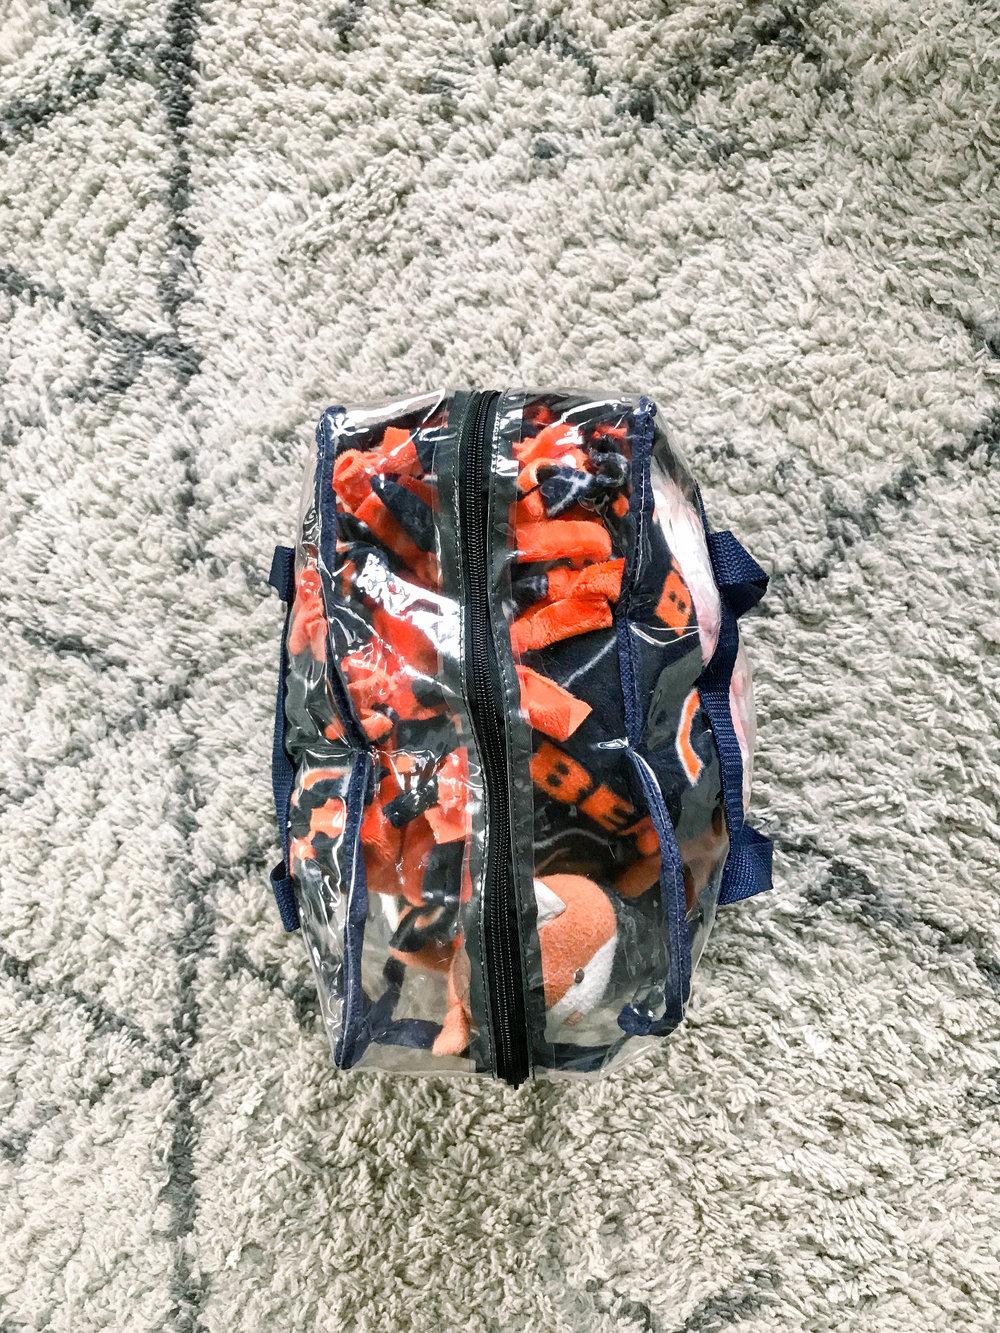 Game Day Bag